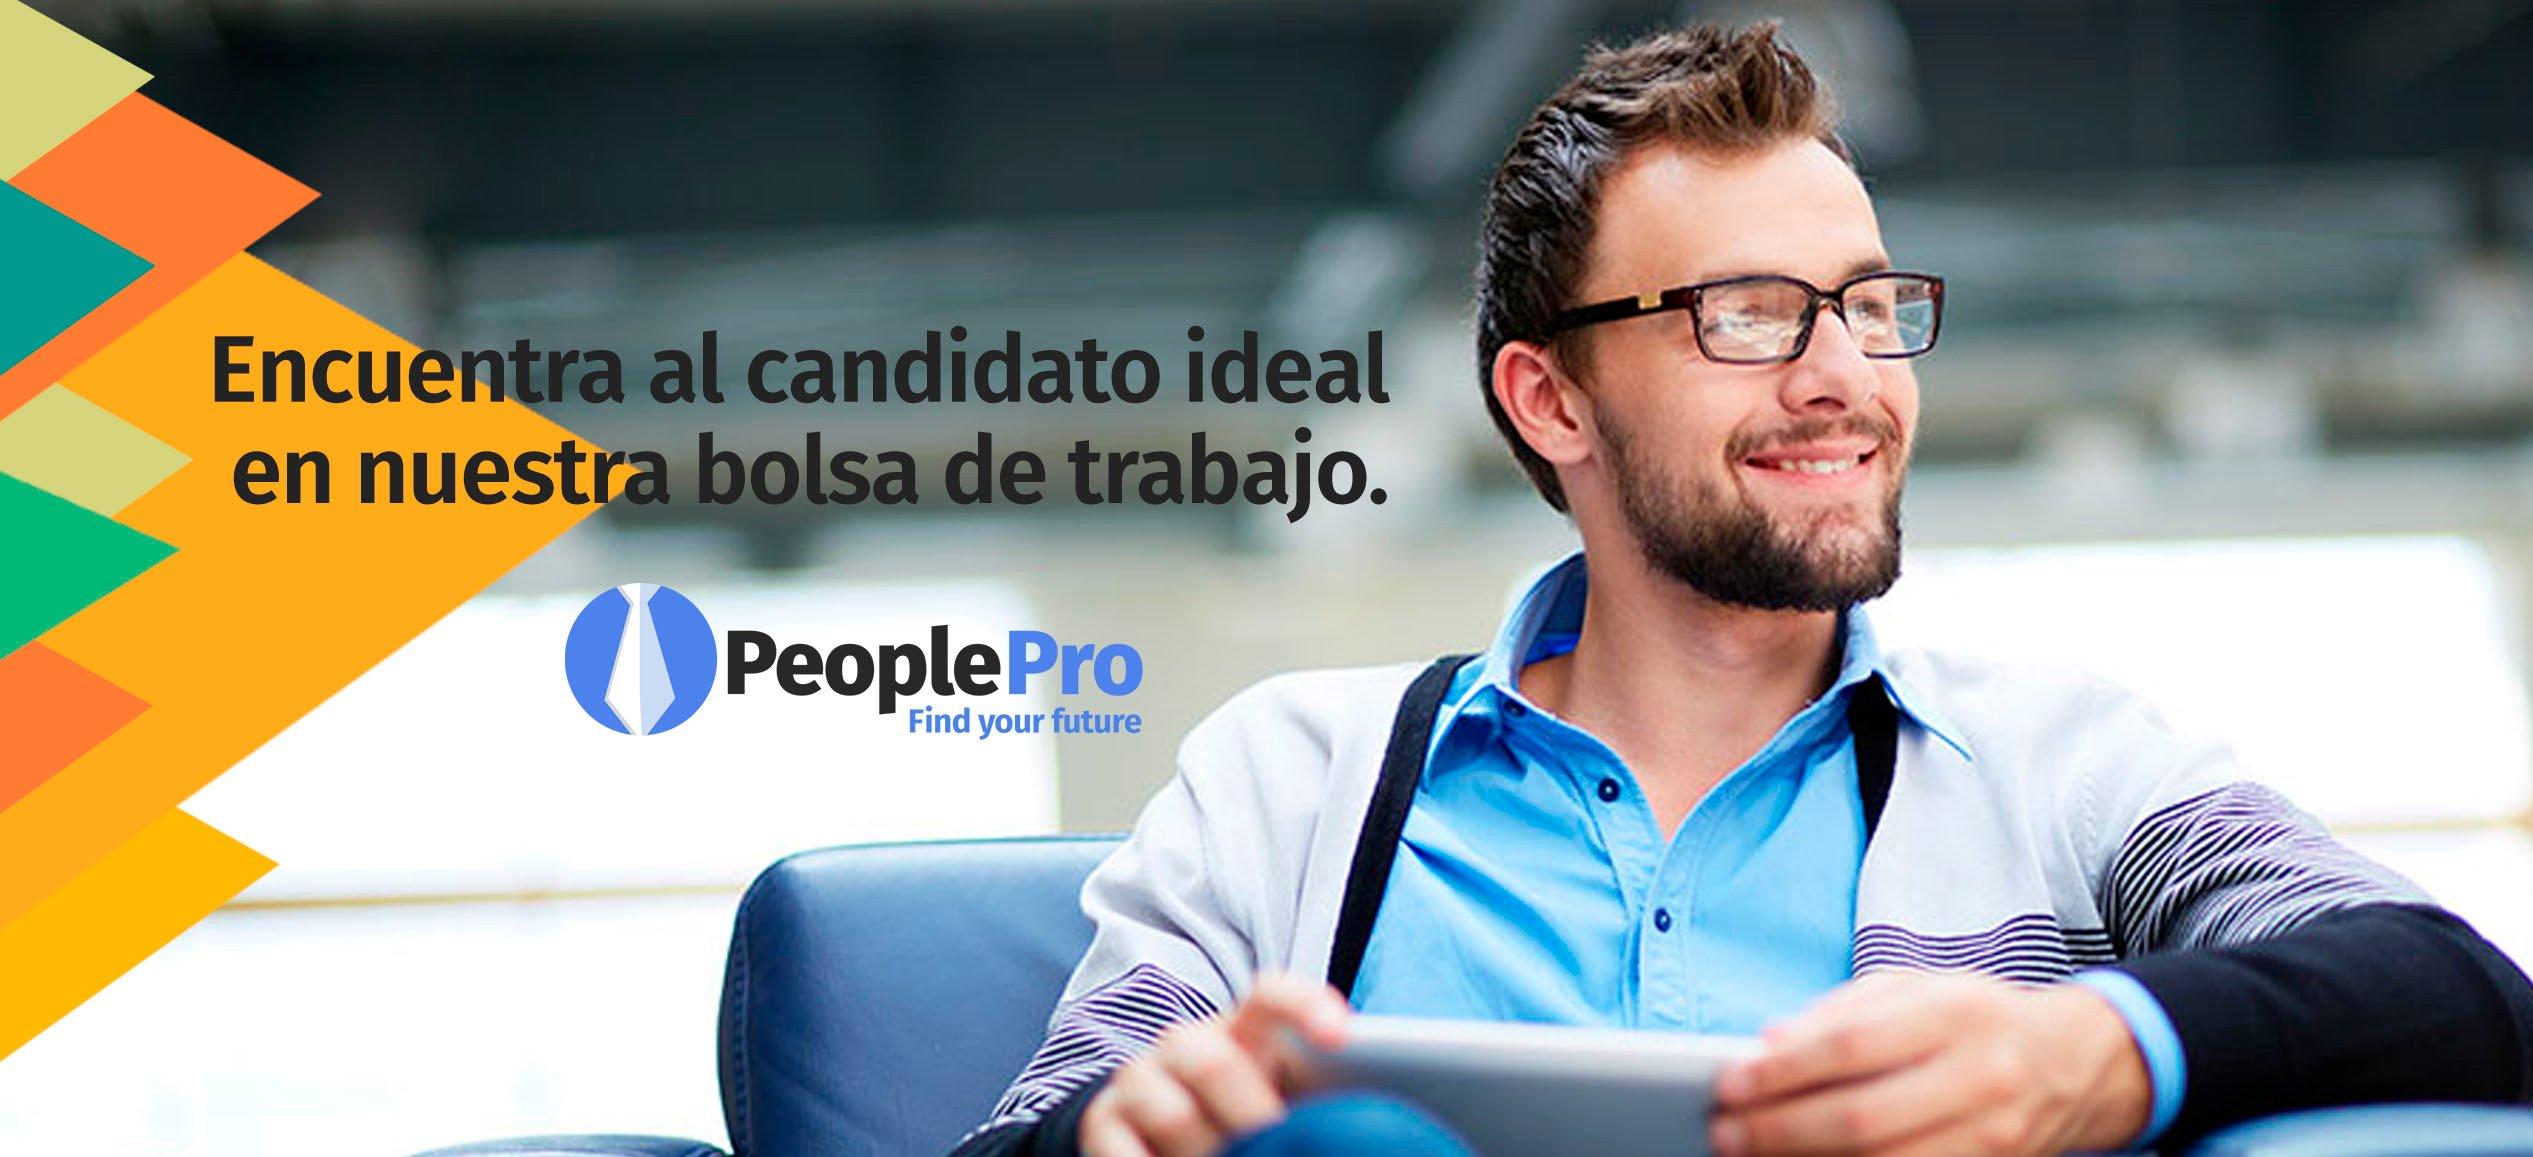 PeoplePro, La Nueva Bolsa de Trabajo